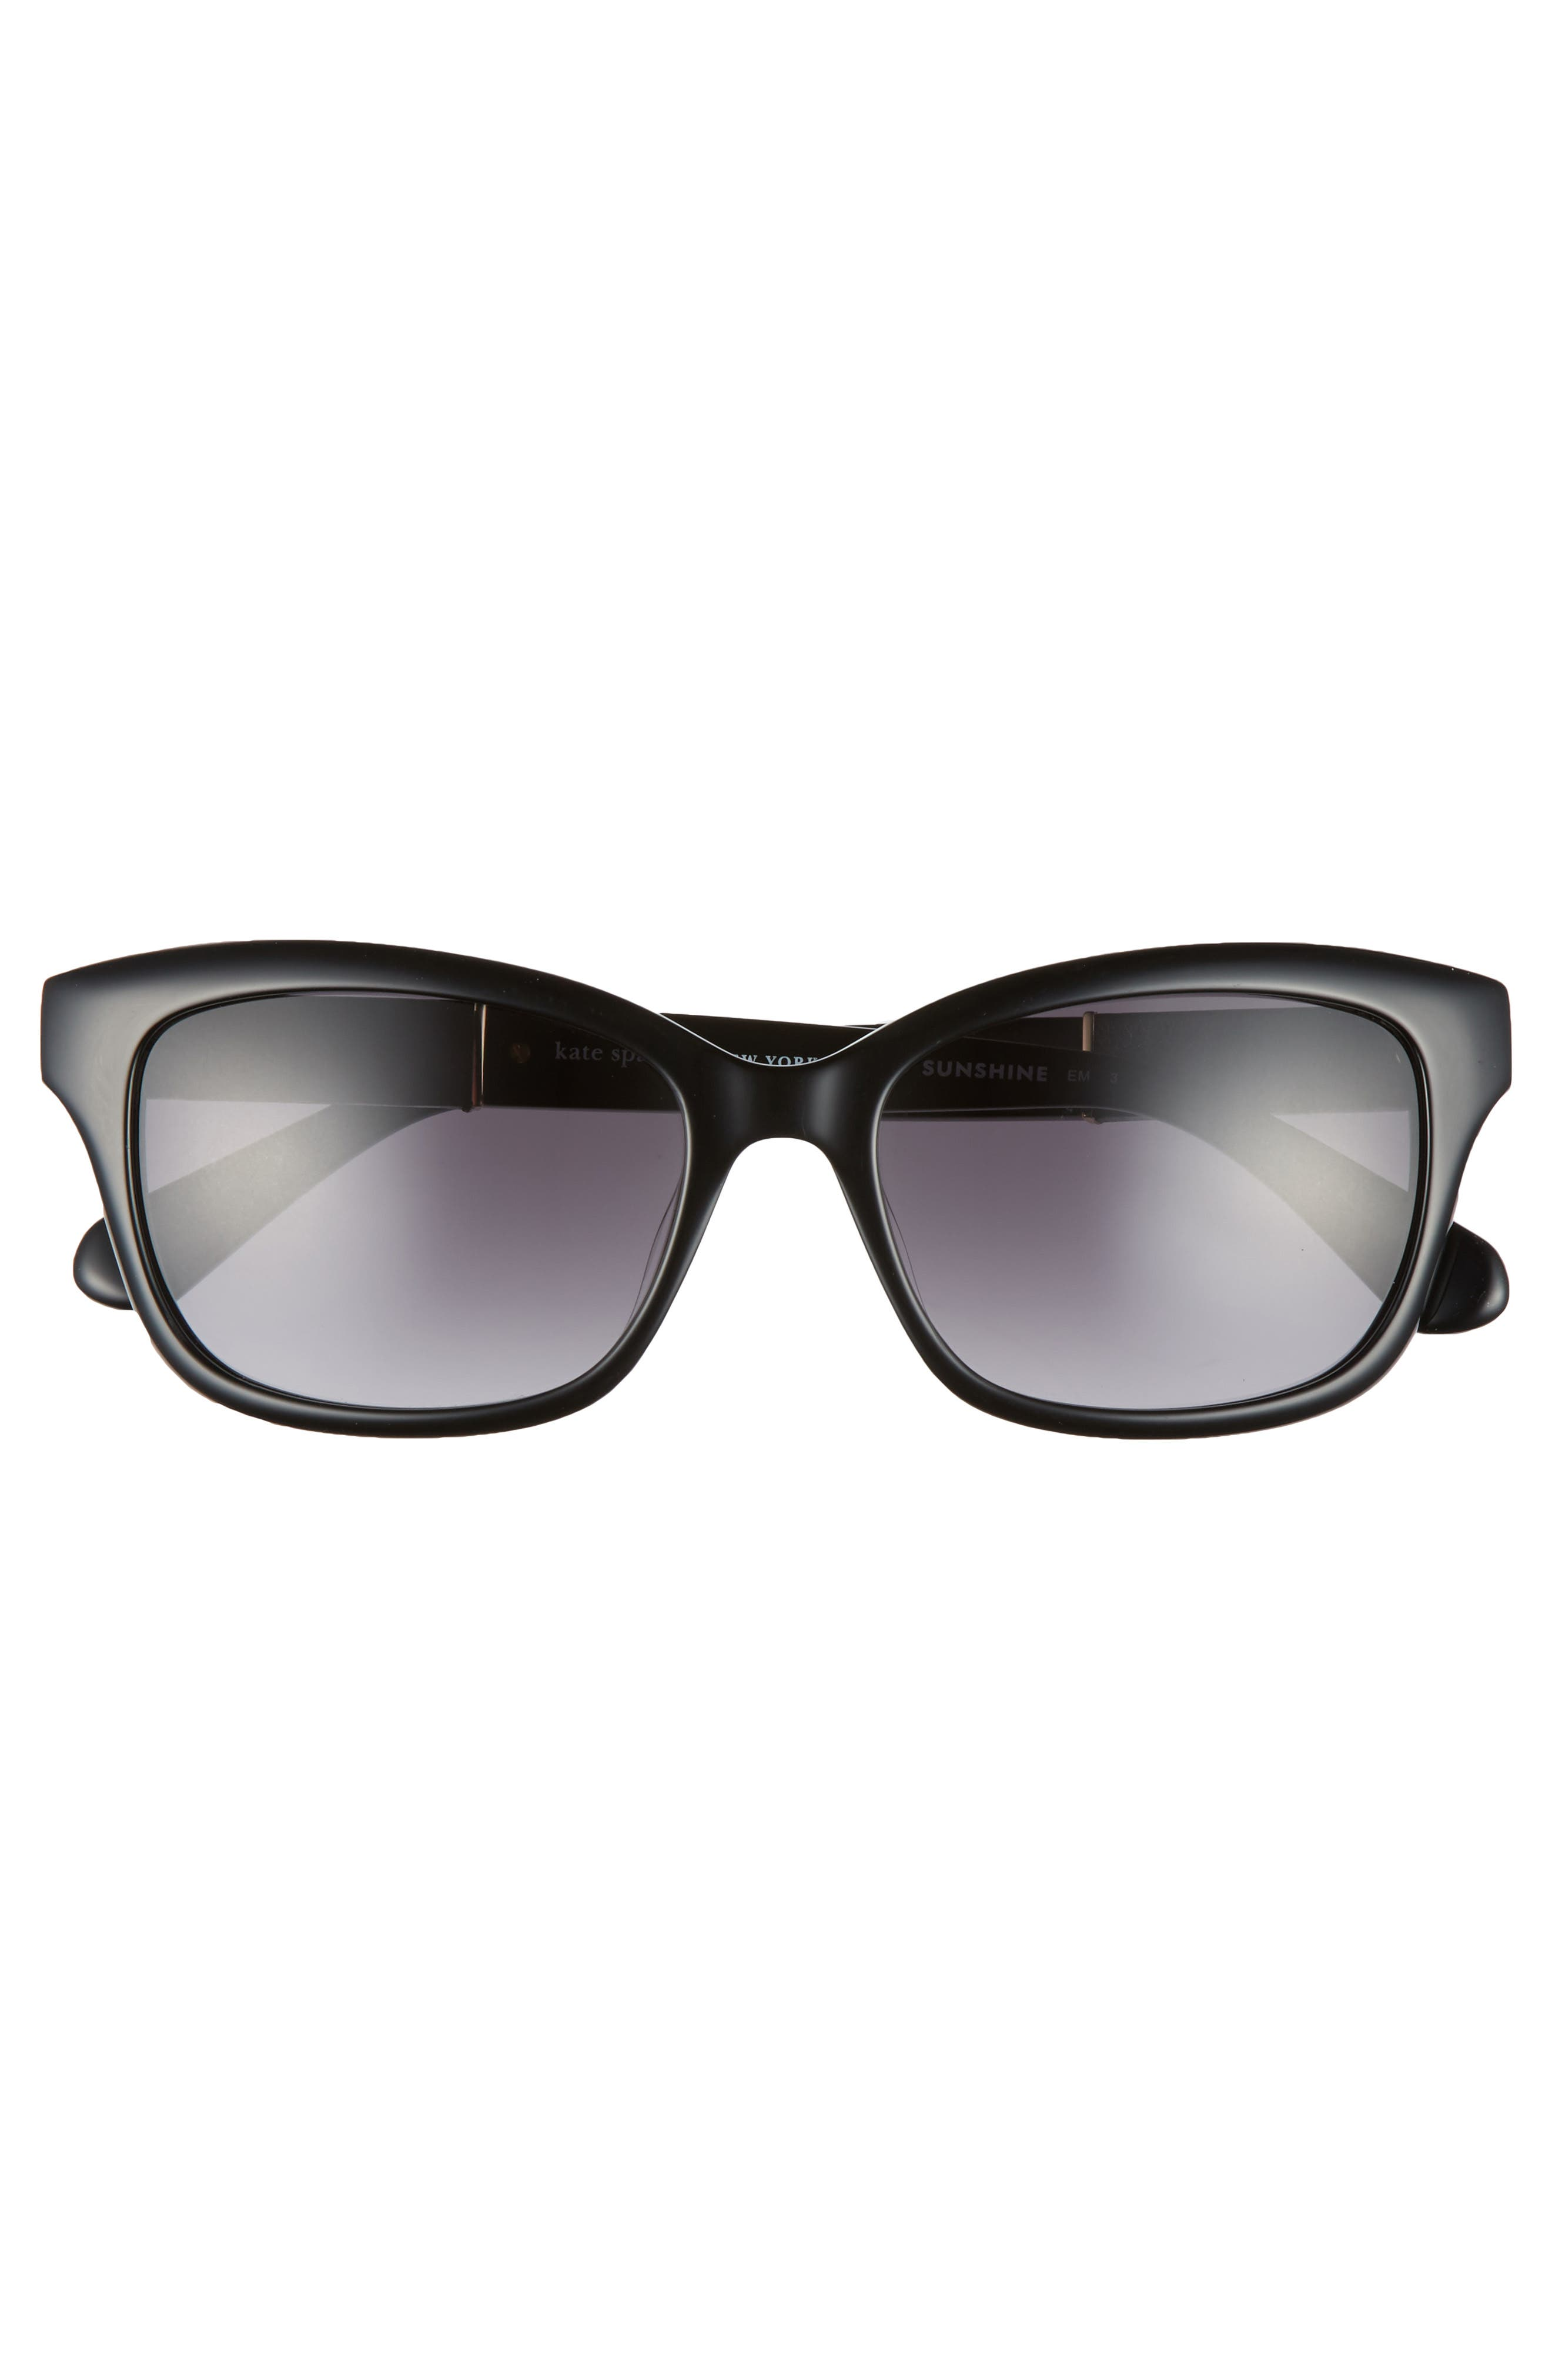 johanna 2 53mm gradient sunglasses,                             Alternate thumbnail 3, color,                             001